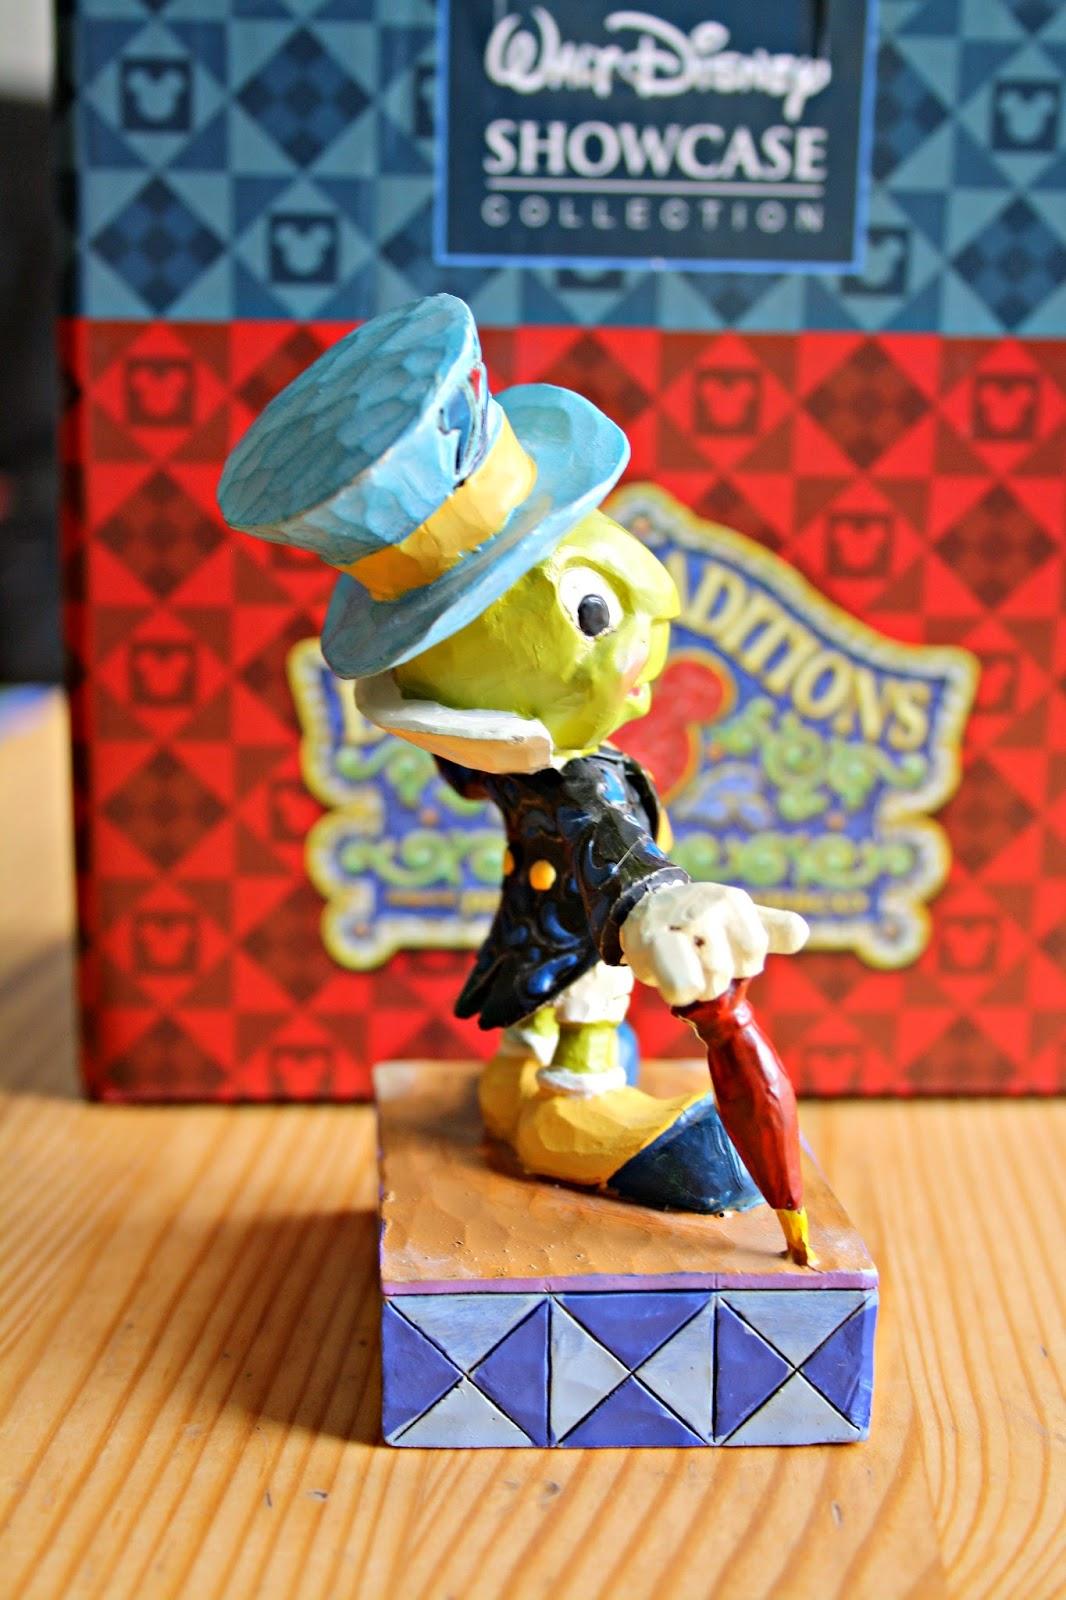 All That Disney Magic Walt Disney Showcase Collection